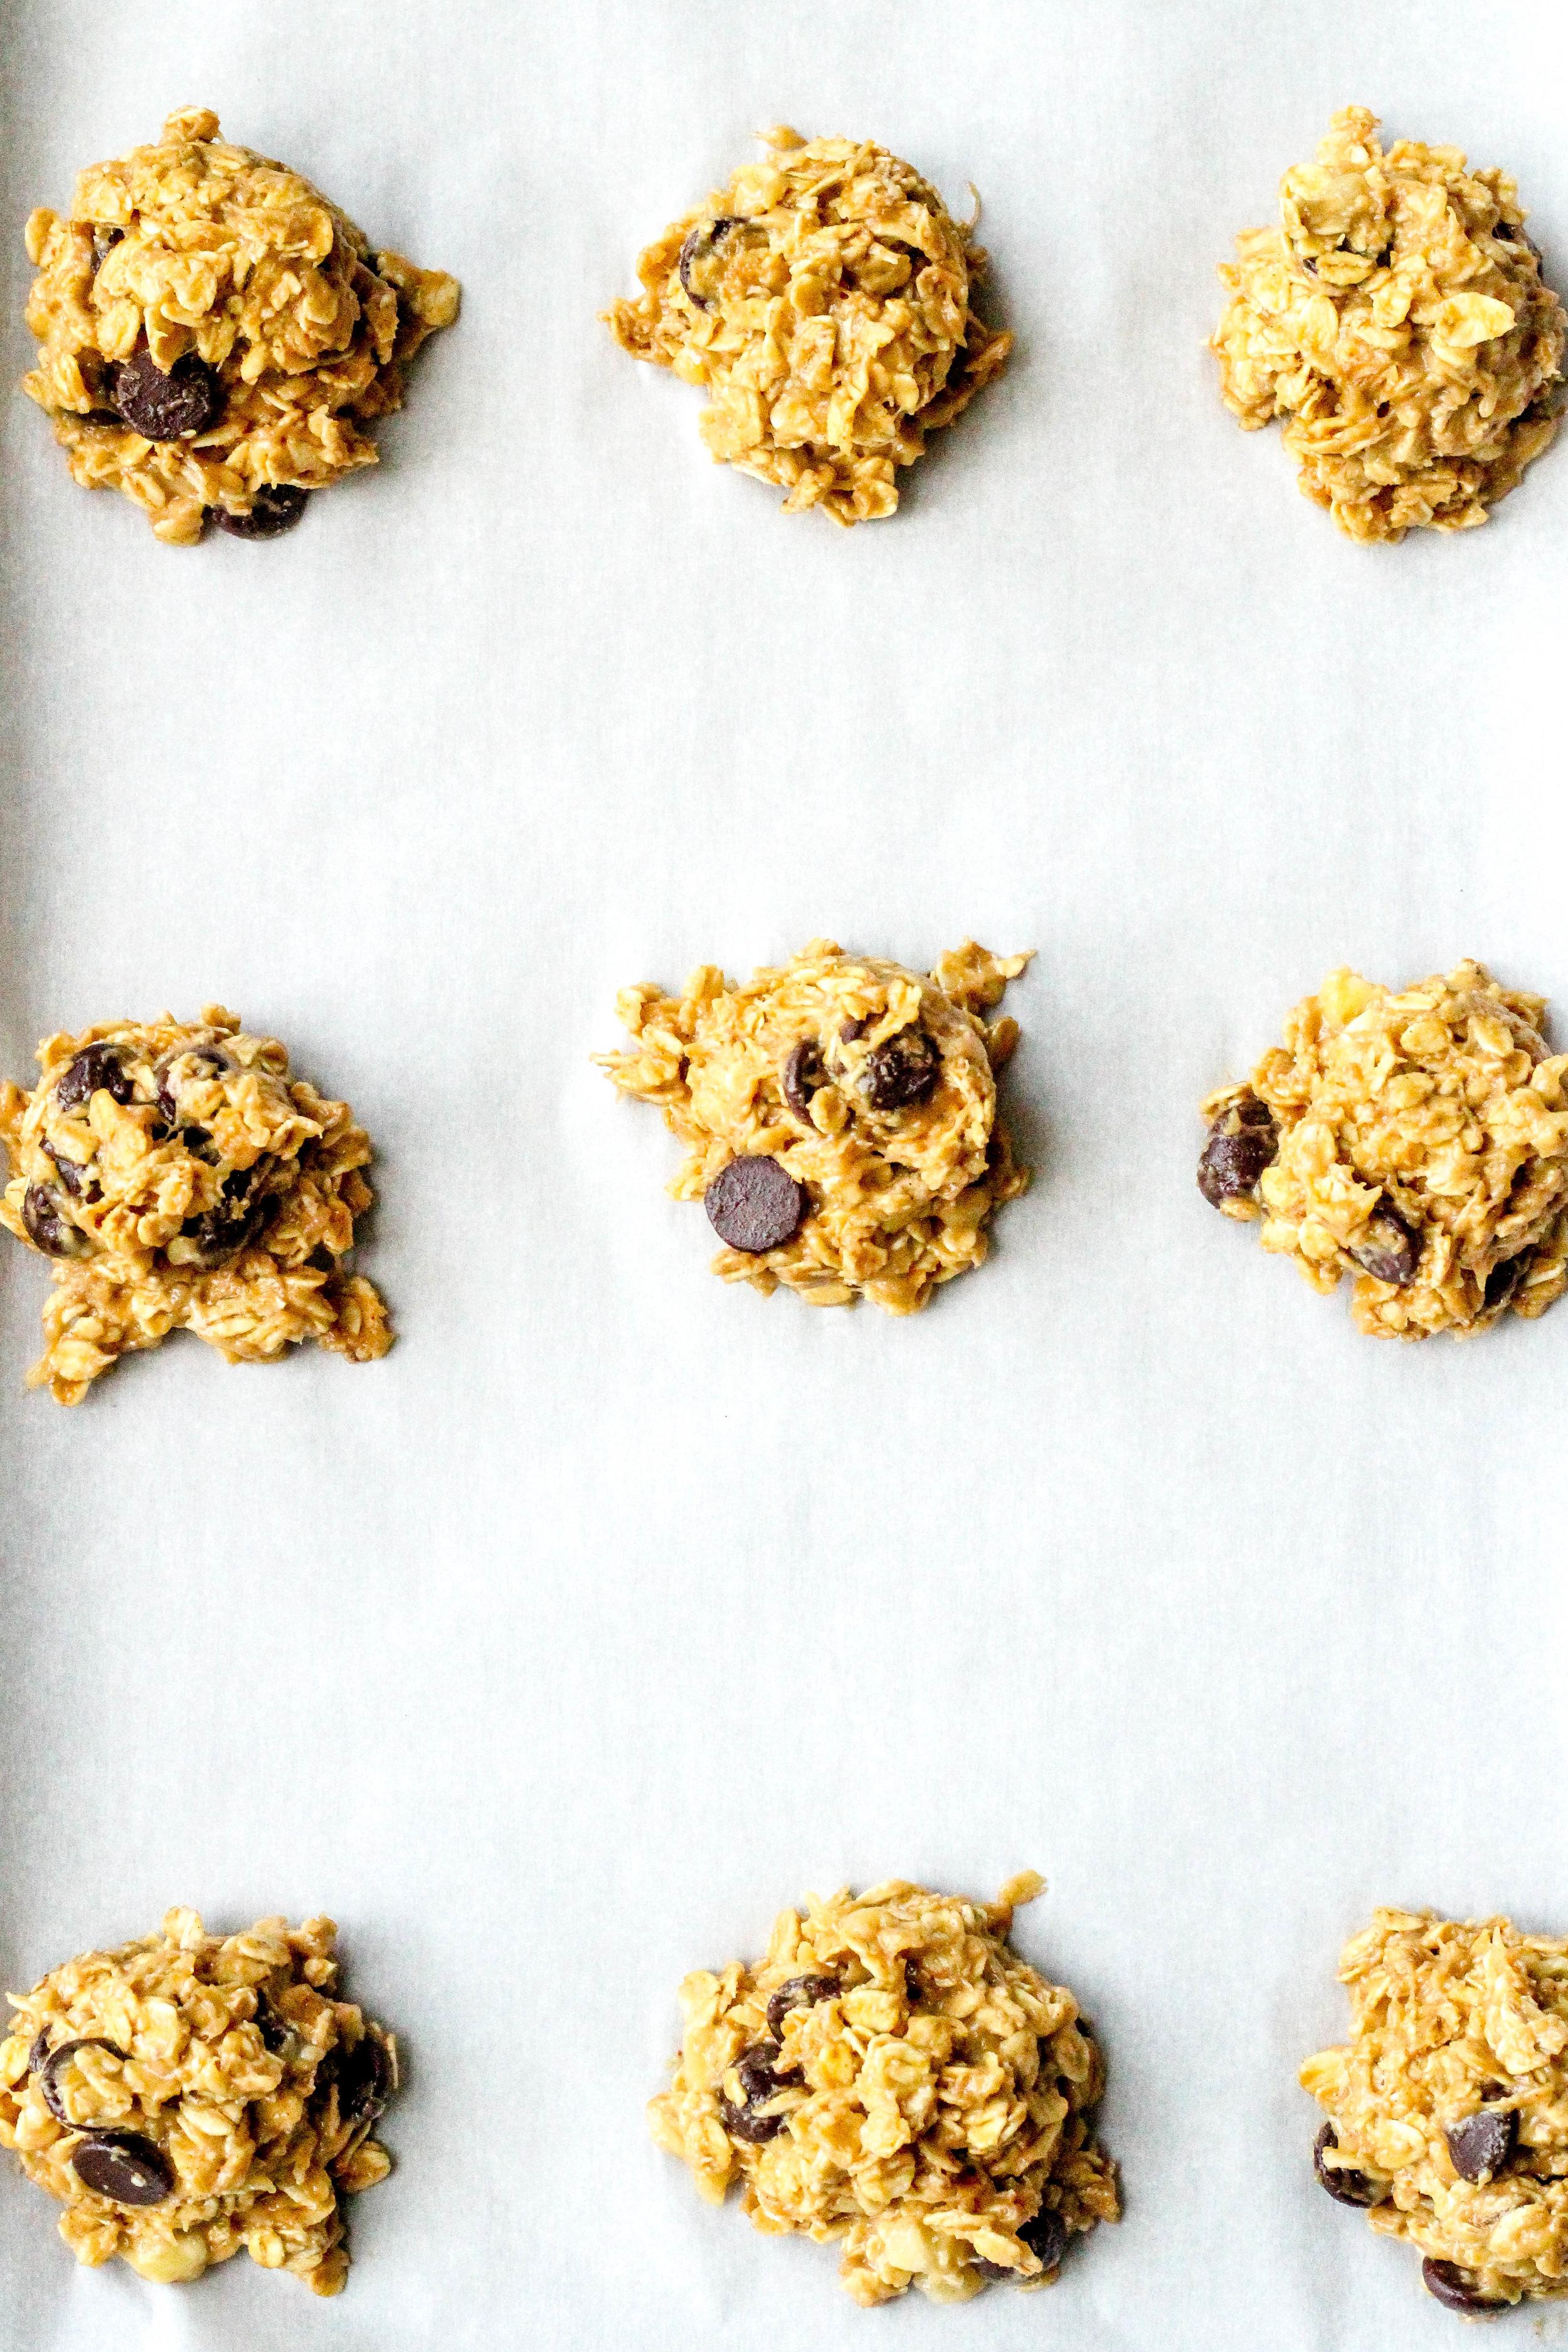 Peanut Butter Banana Chocolate Chip Oatmeal Cookies